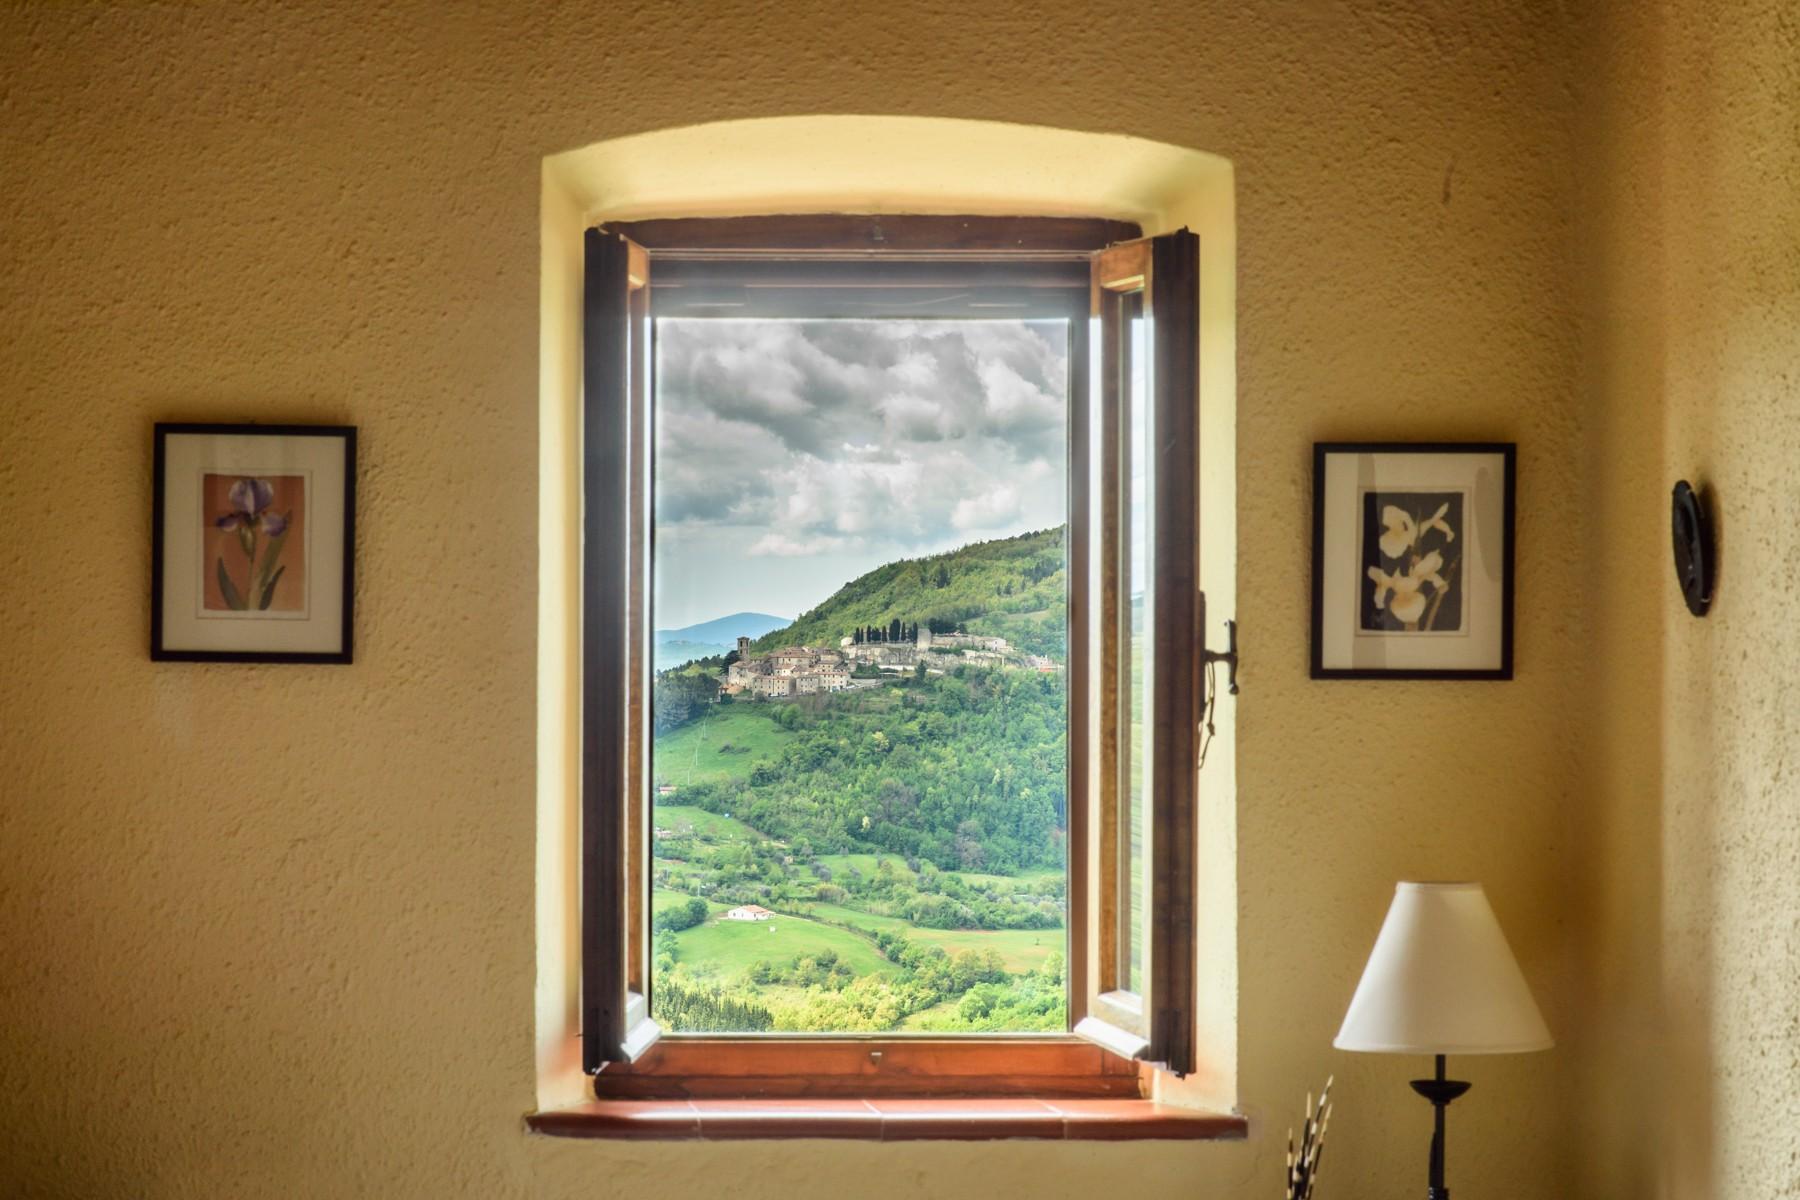 Casa indipendente in Vendita a Semproniano: 4 locali, 220 mq - Foto 1